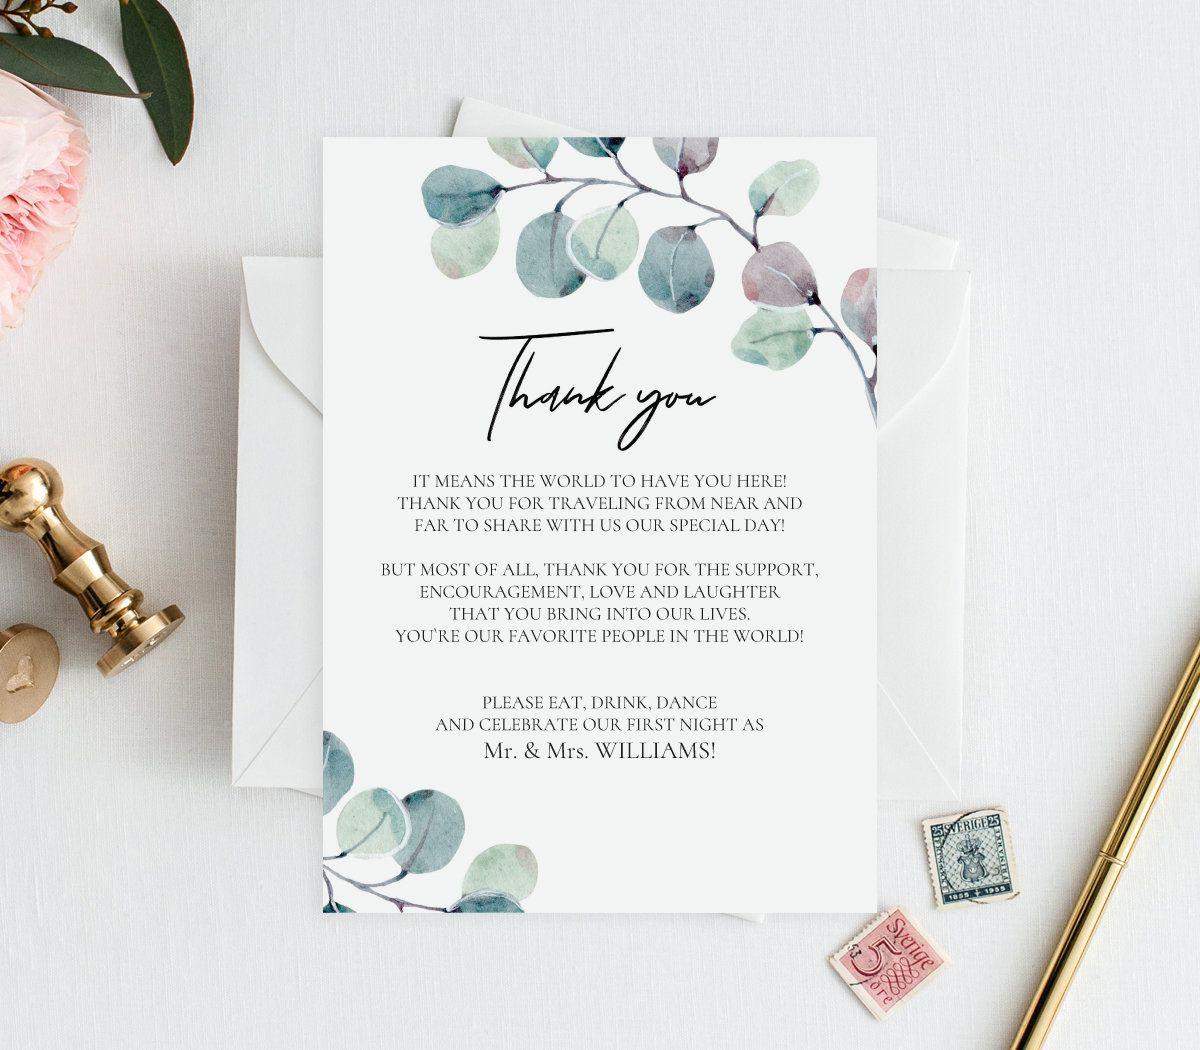 Editable PDF Thank You Card 5x7, 4x6 Thank you note